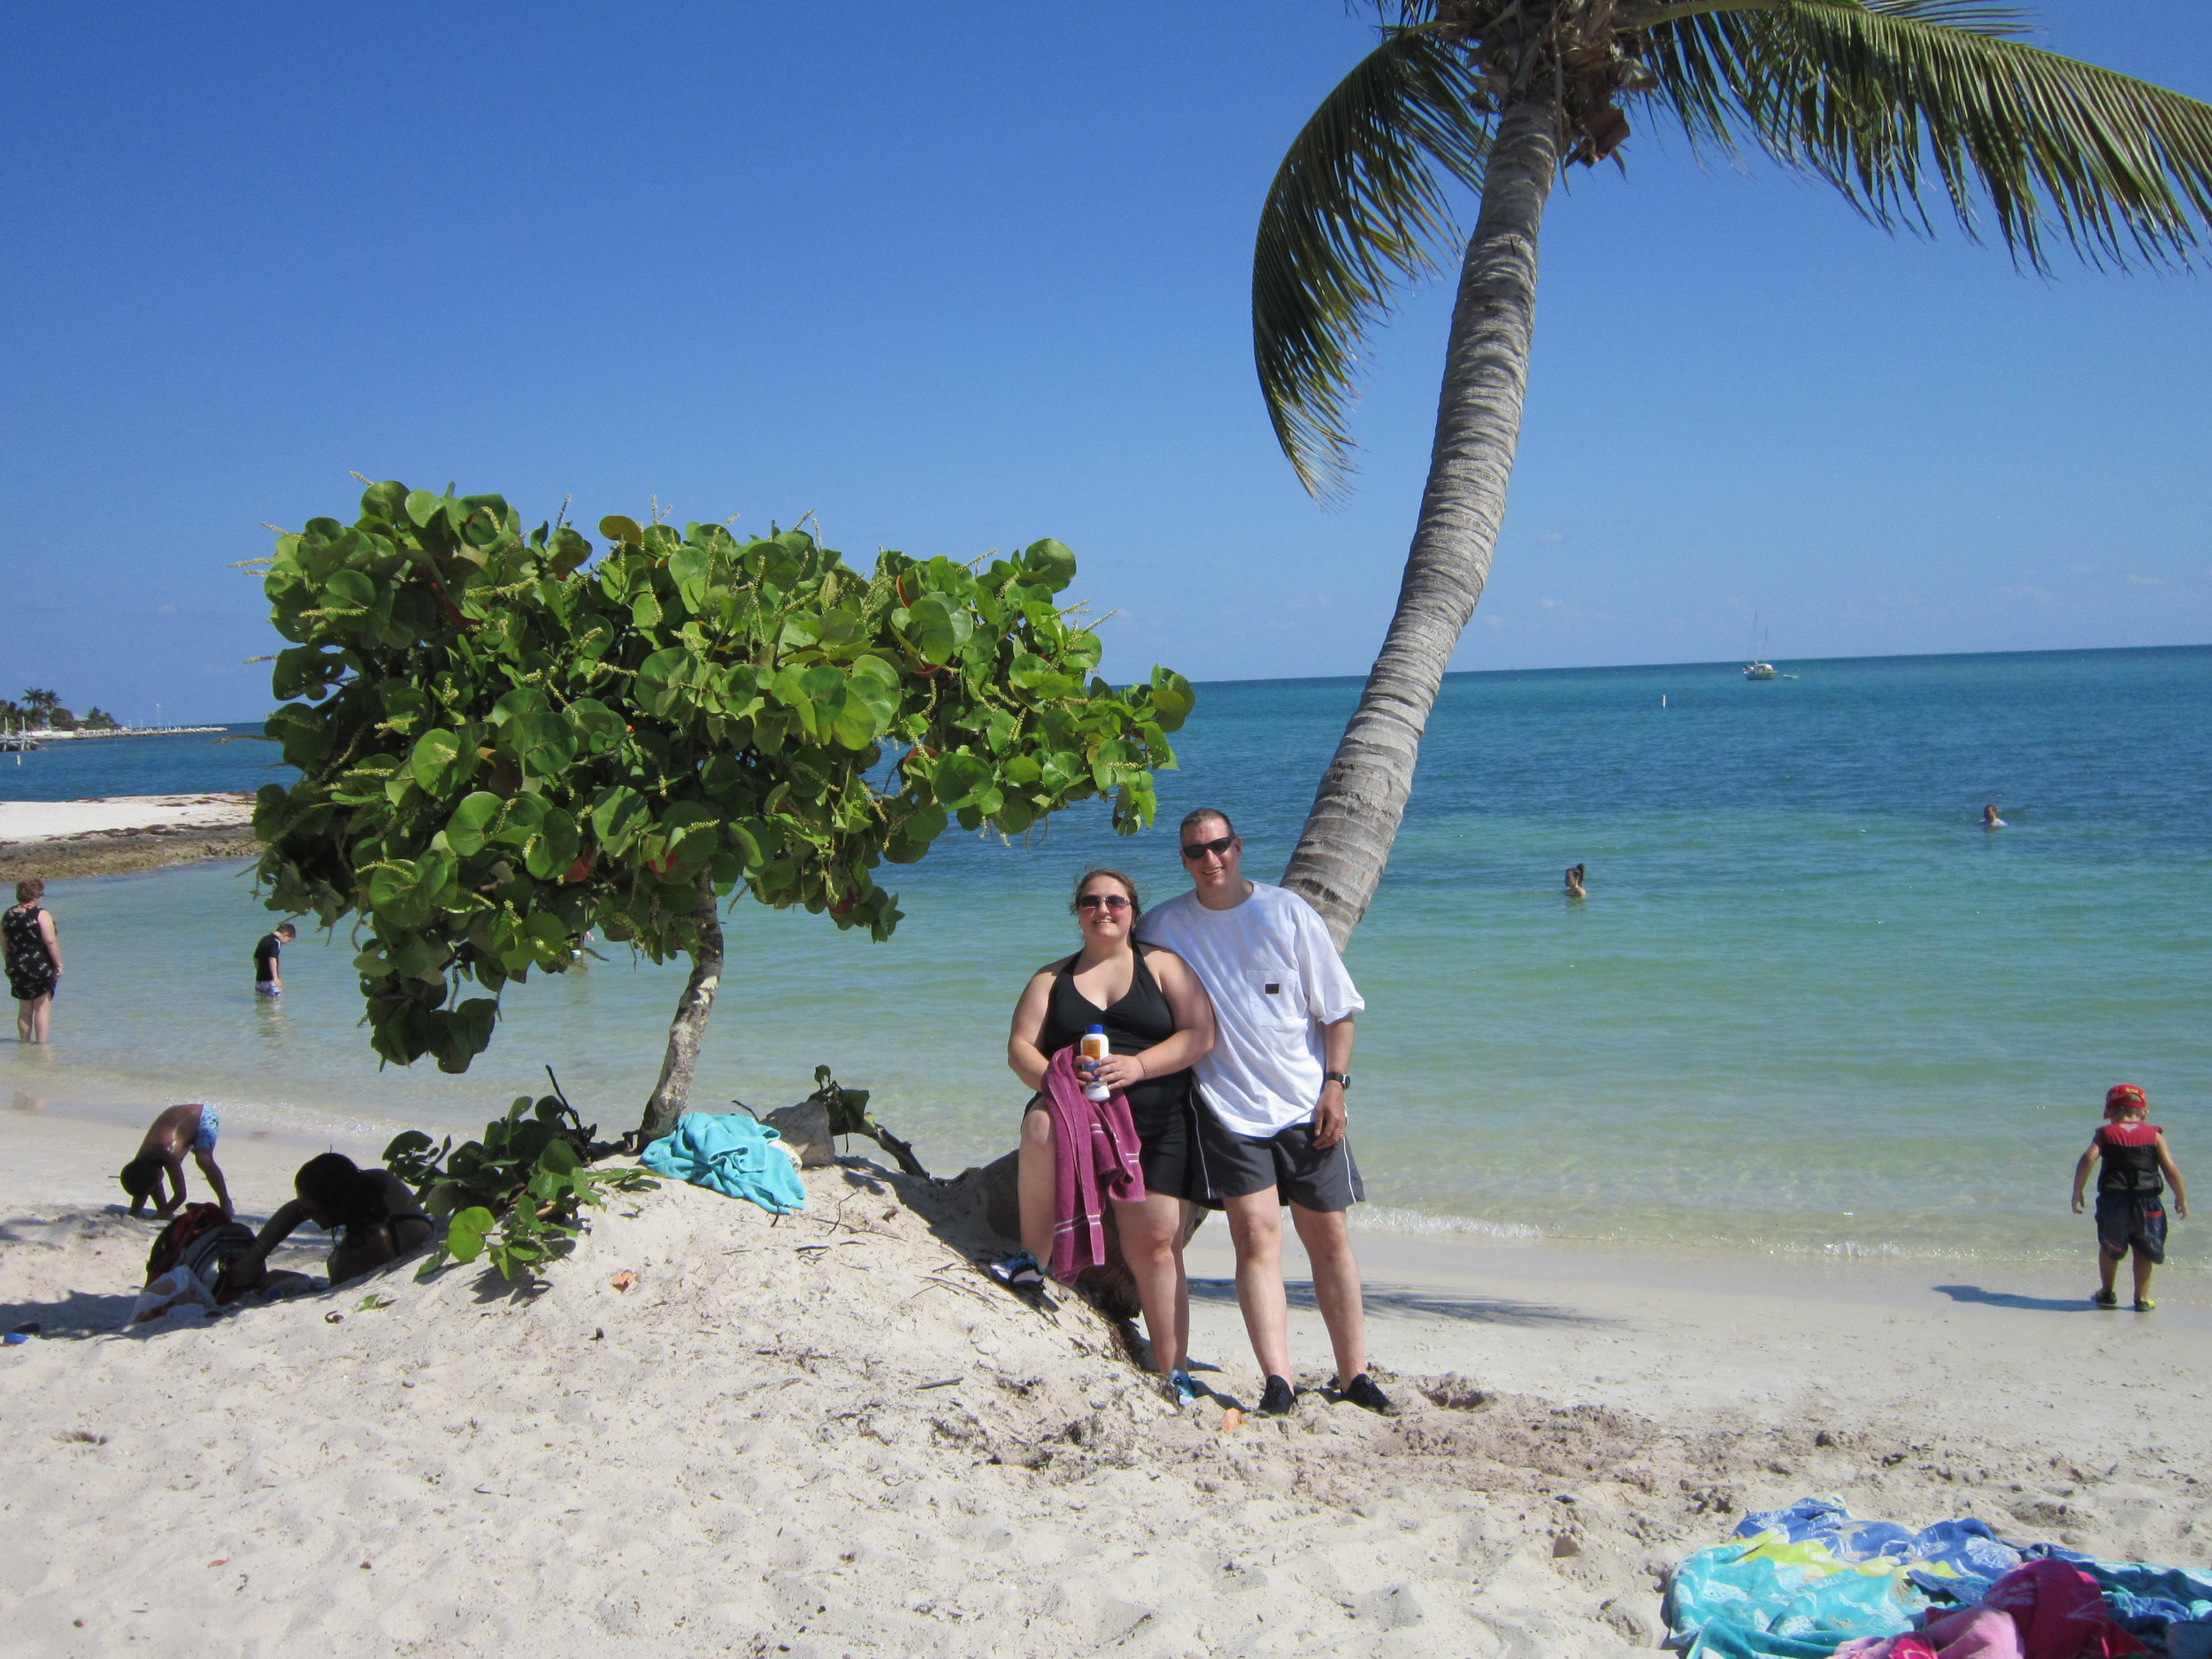 swimming in the ocean at sombrero beach in marathon key, florida